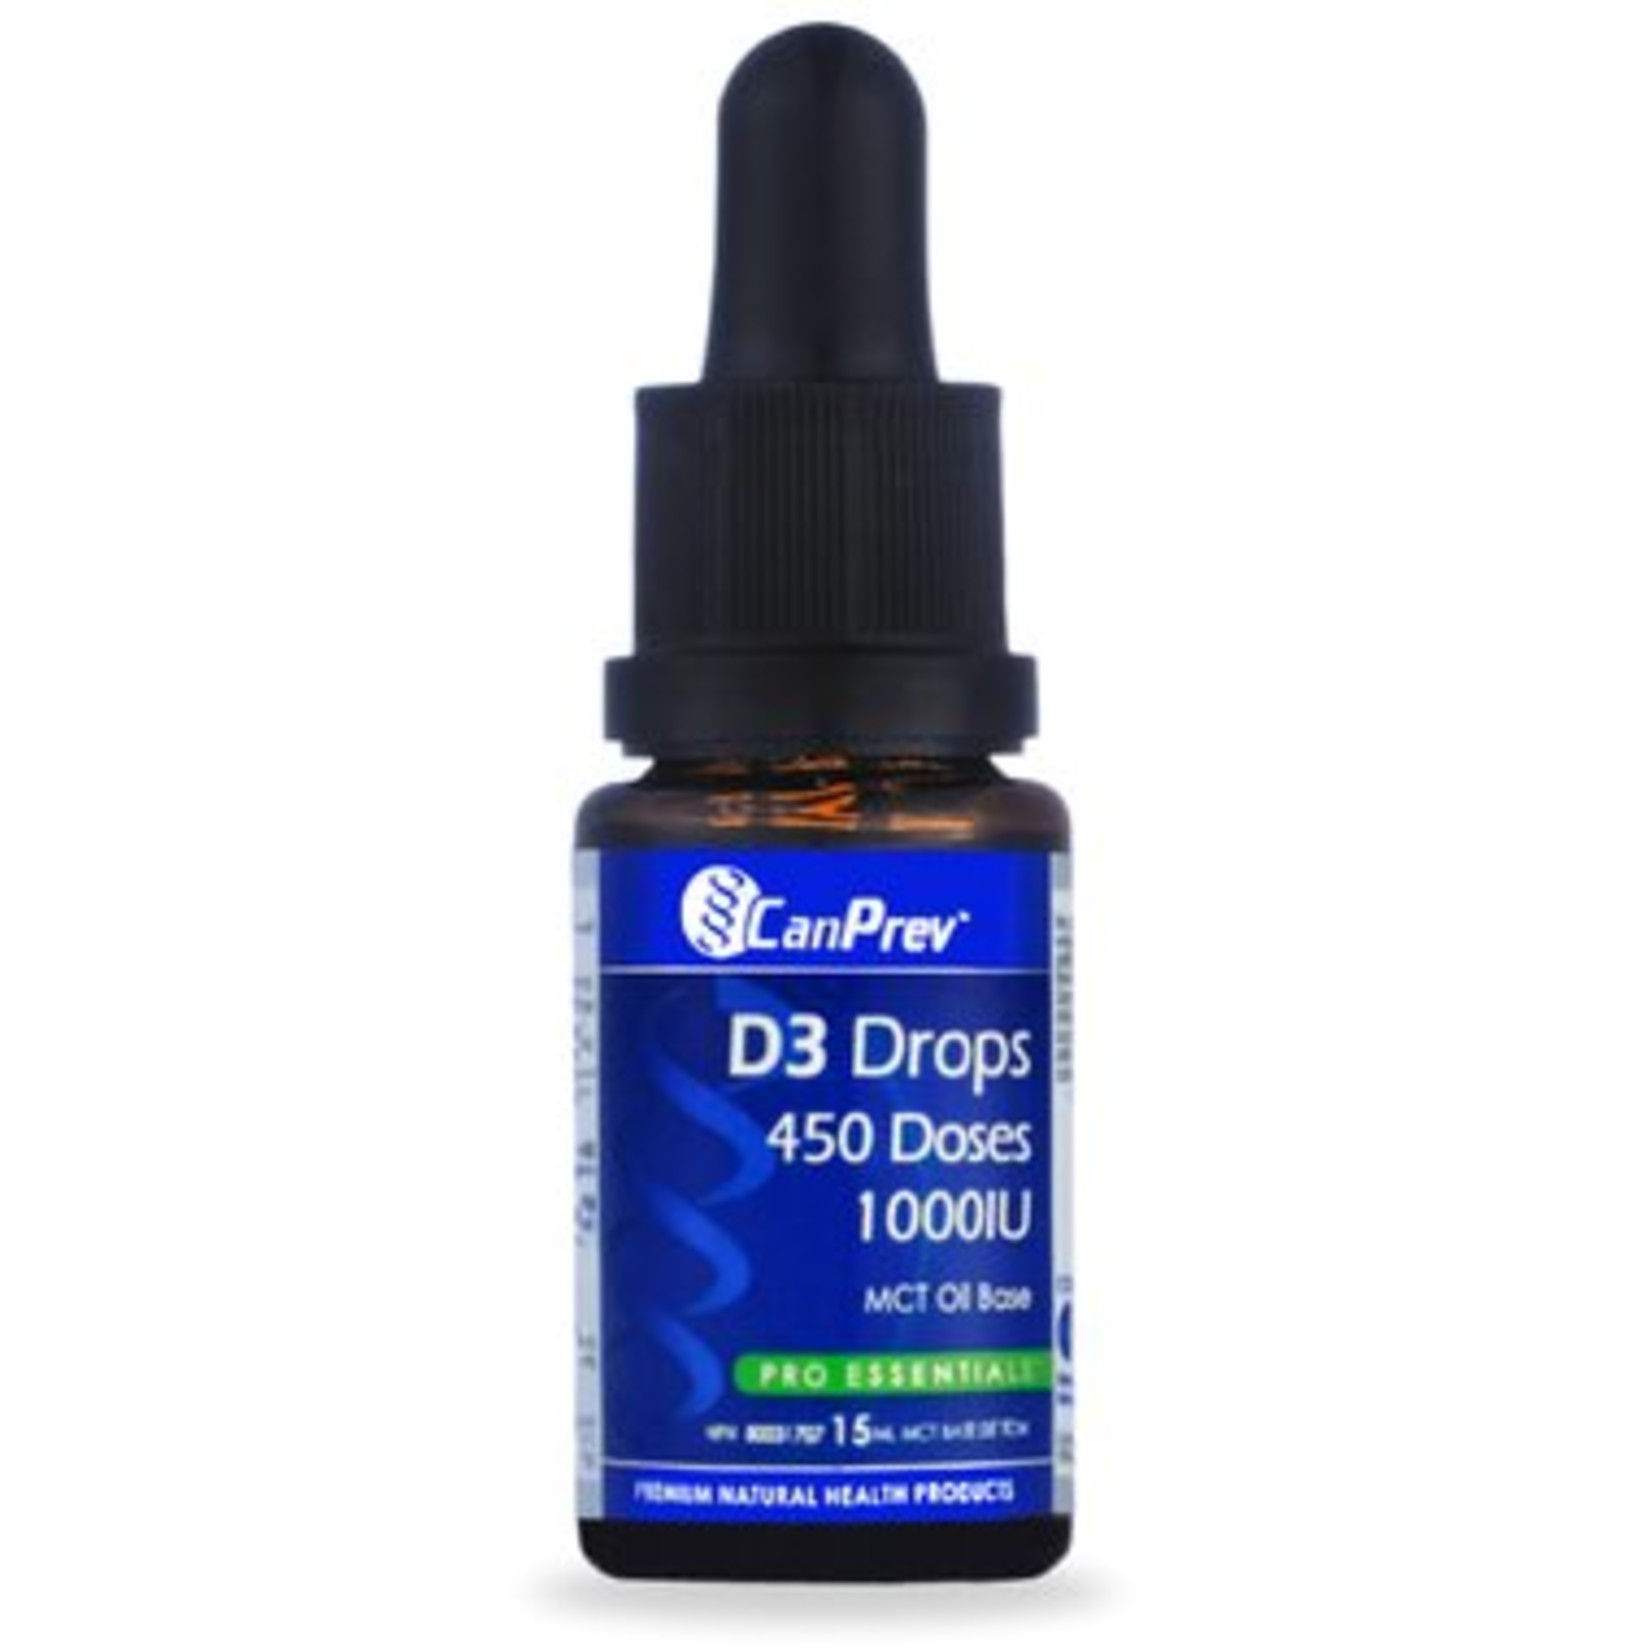 Can Prev Can Prev D3 Drops 1000IU- MCT base 15mL